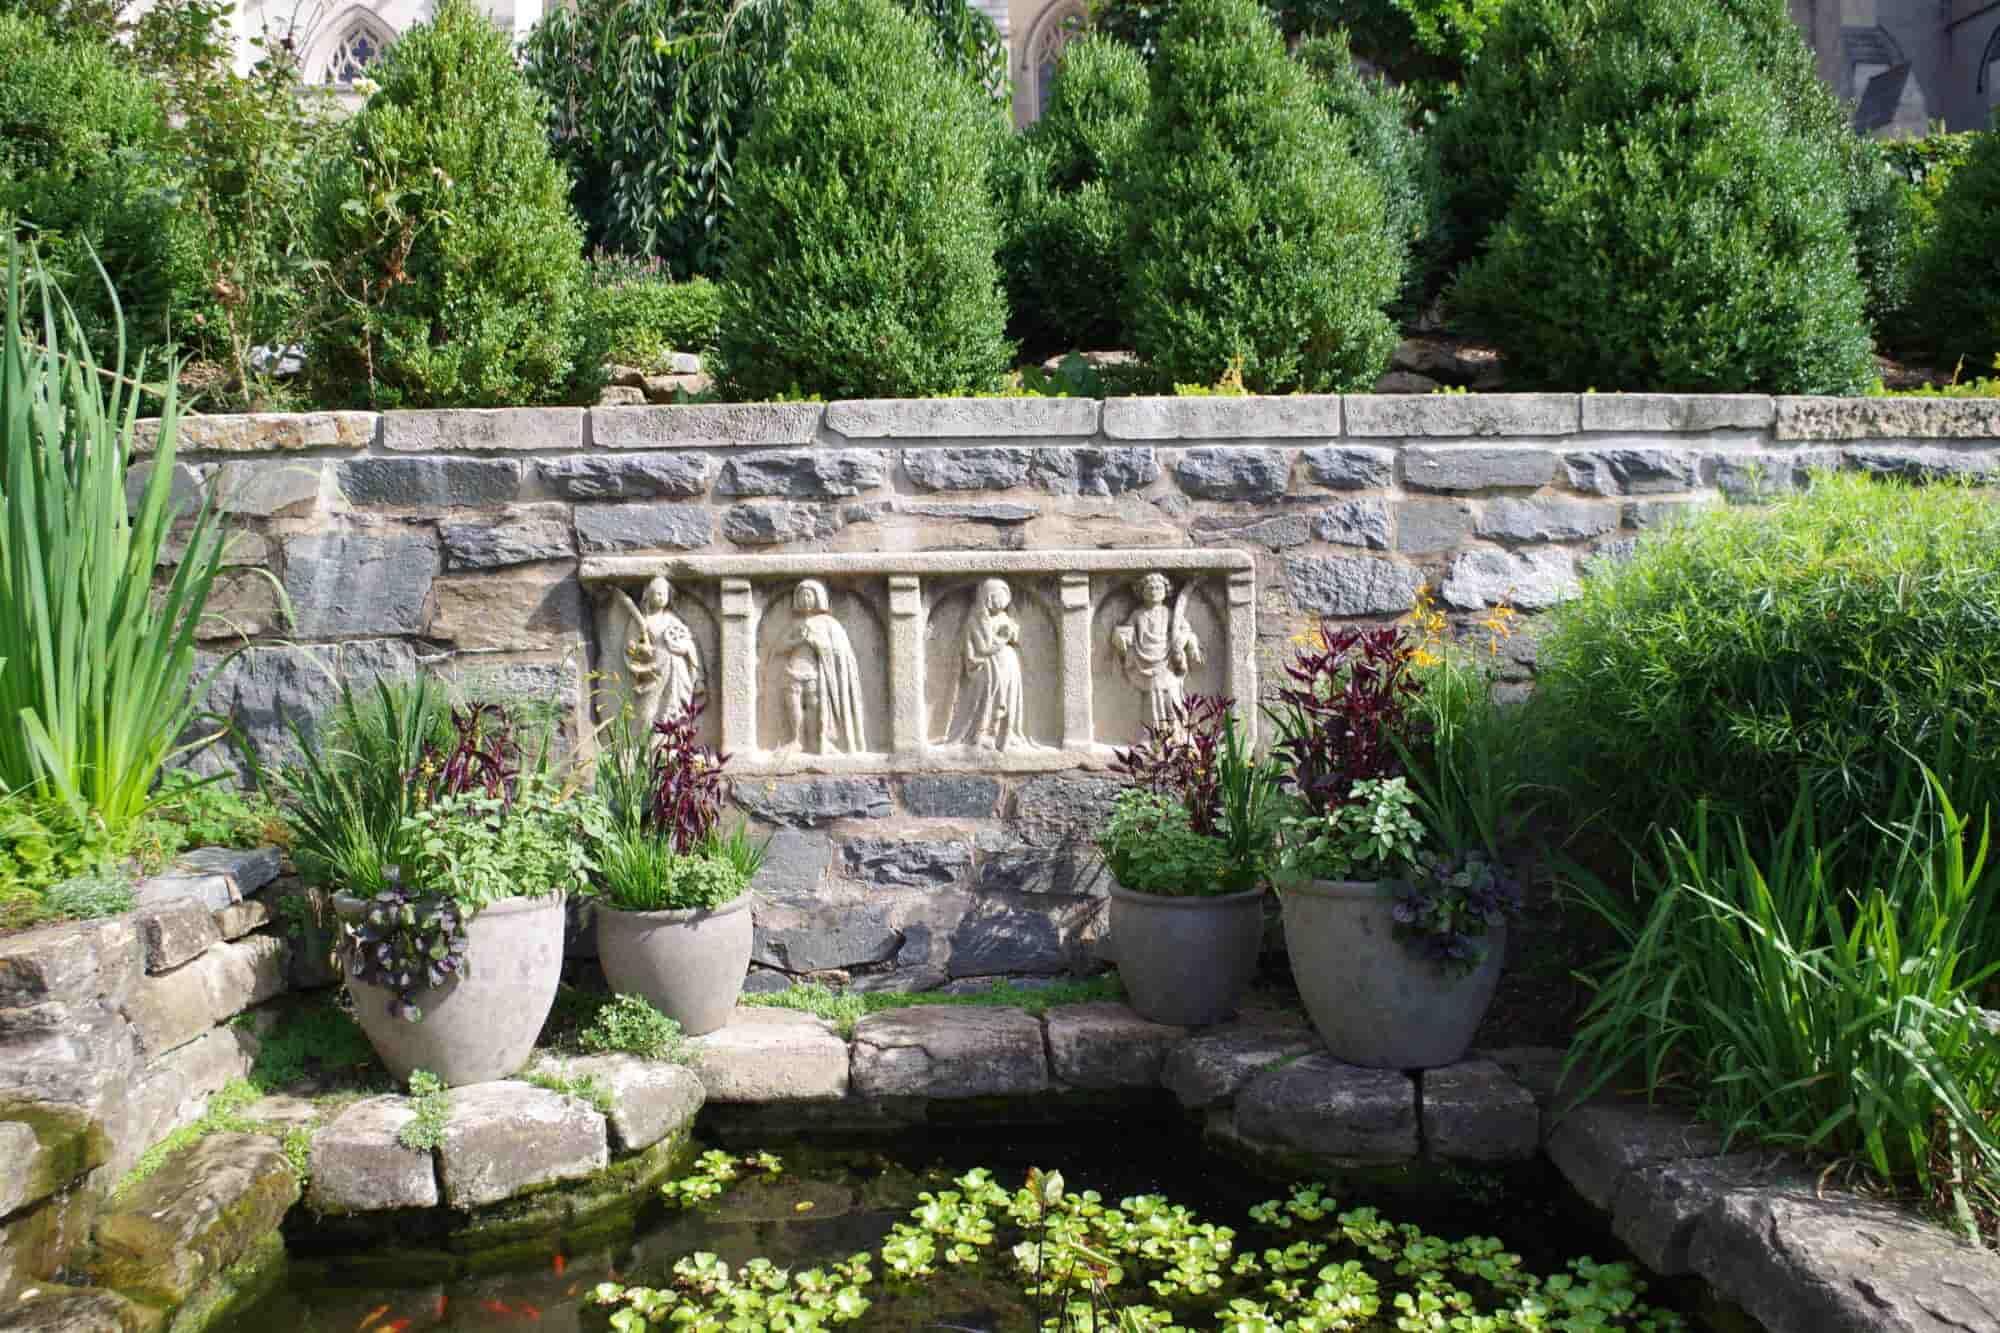 Garden Artifact 13